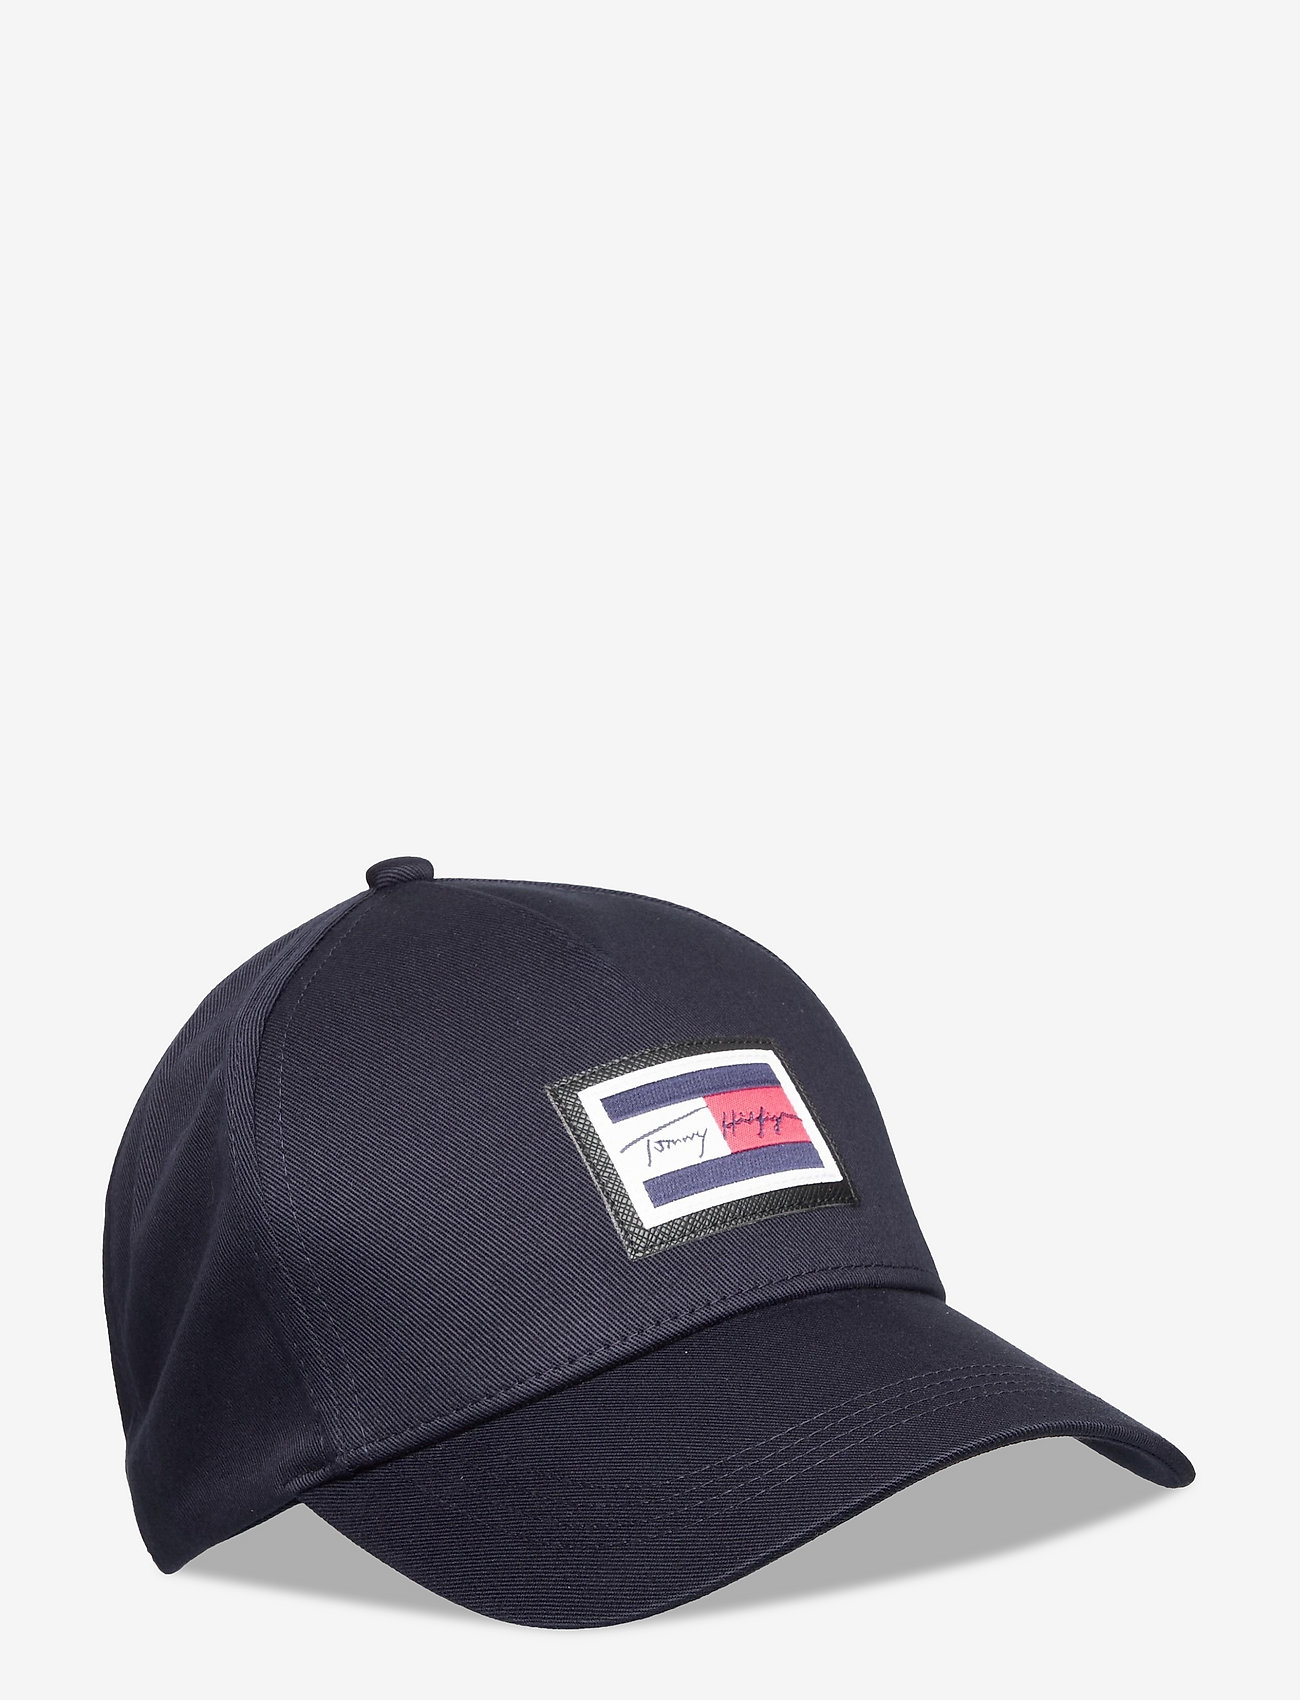 Tommy Hilfiger - SIGNATURE FLAG CAP - czapki - desert sky - 0